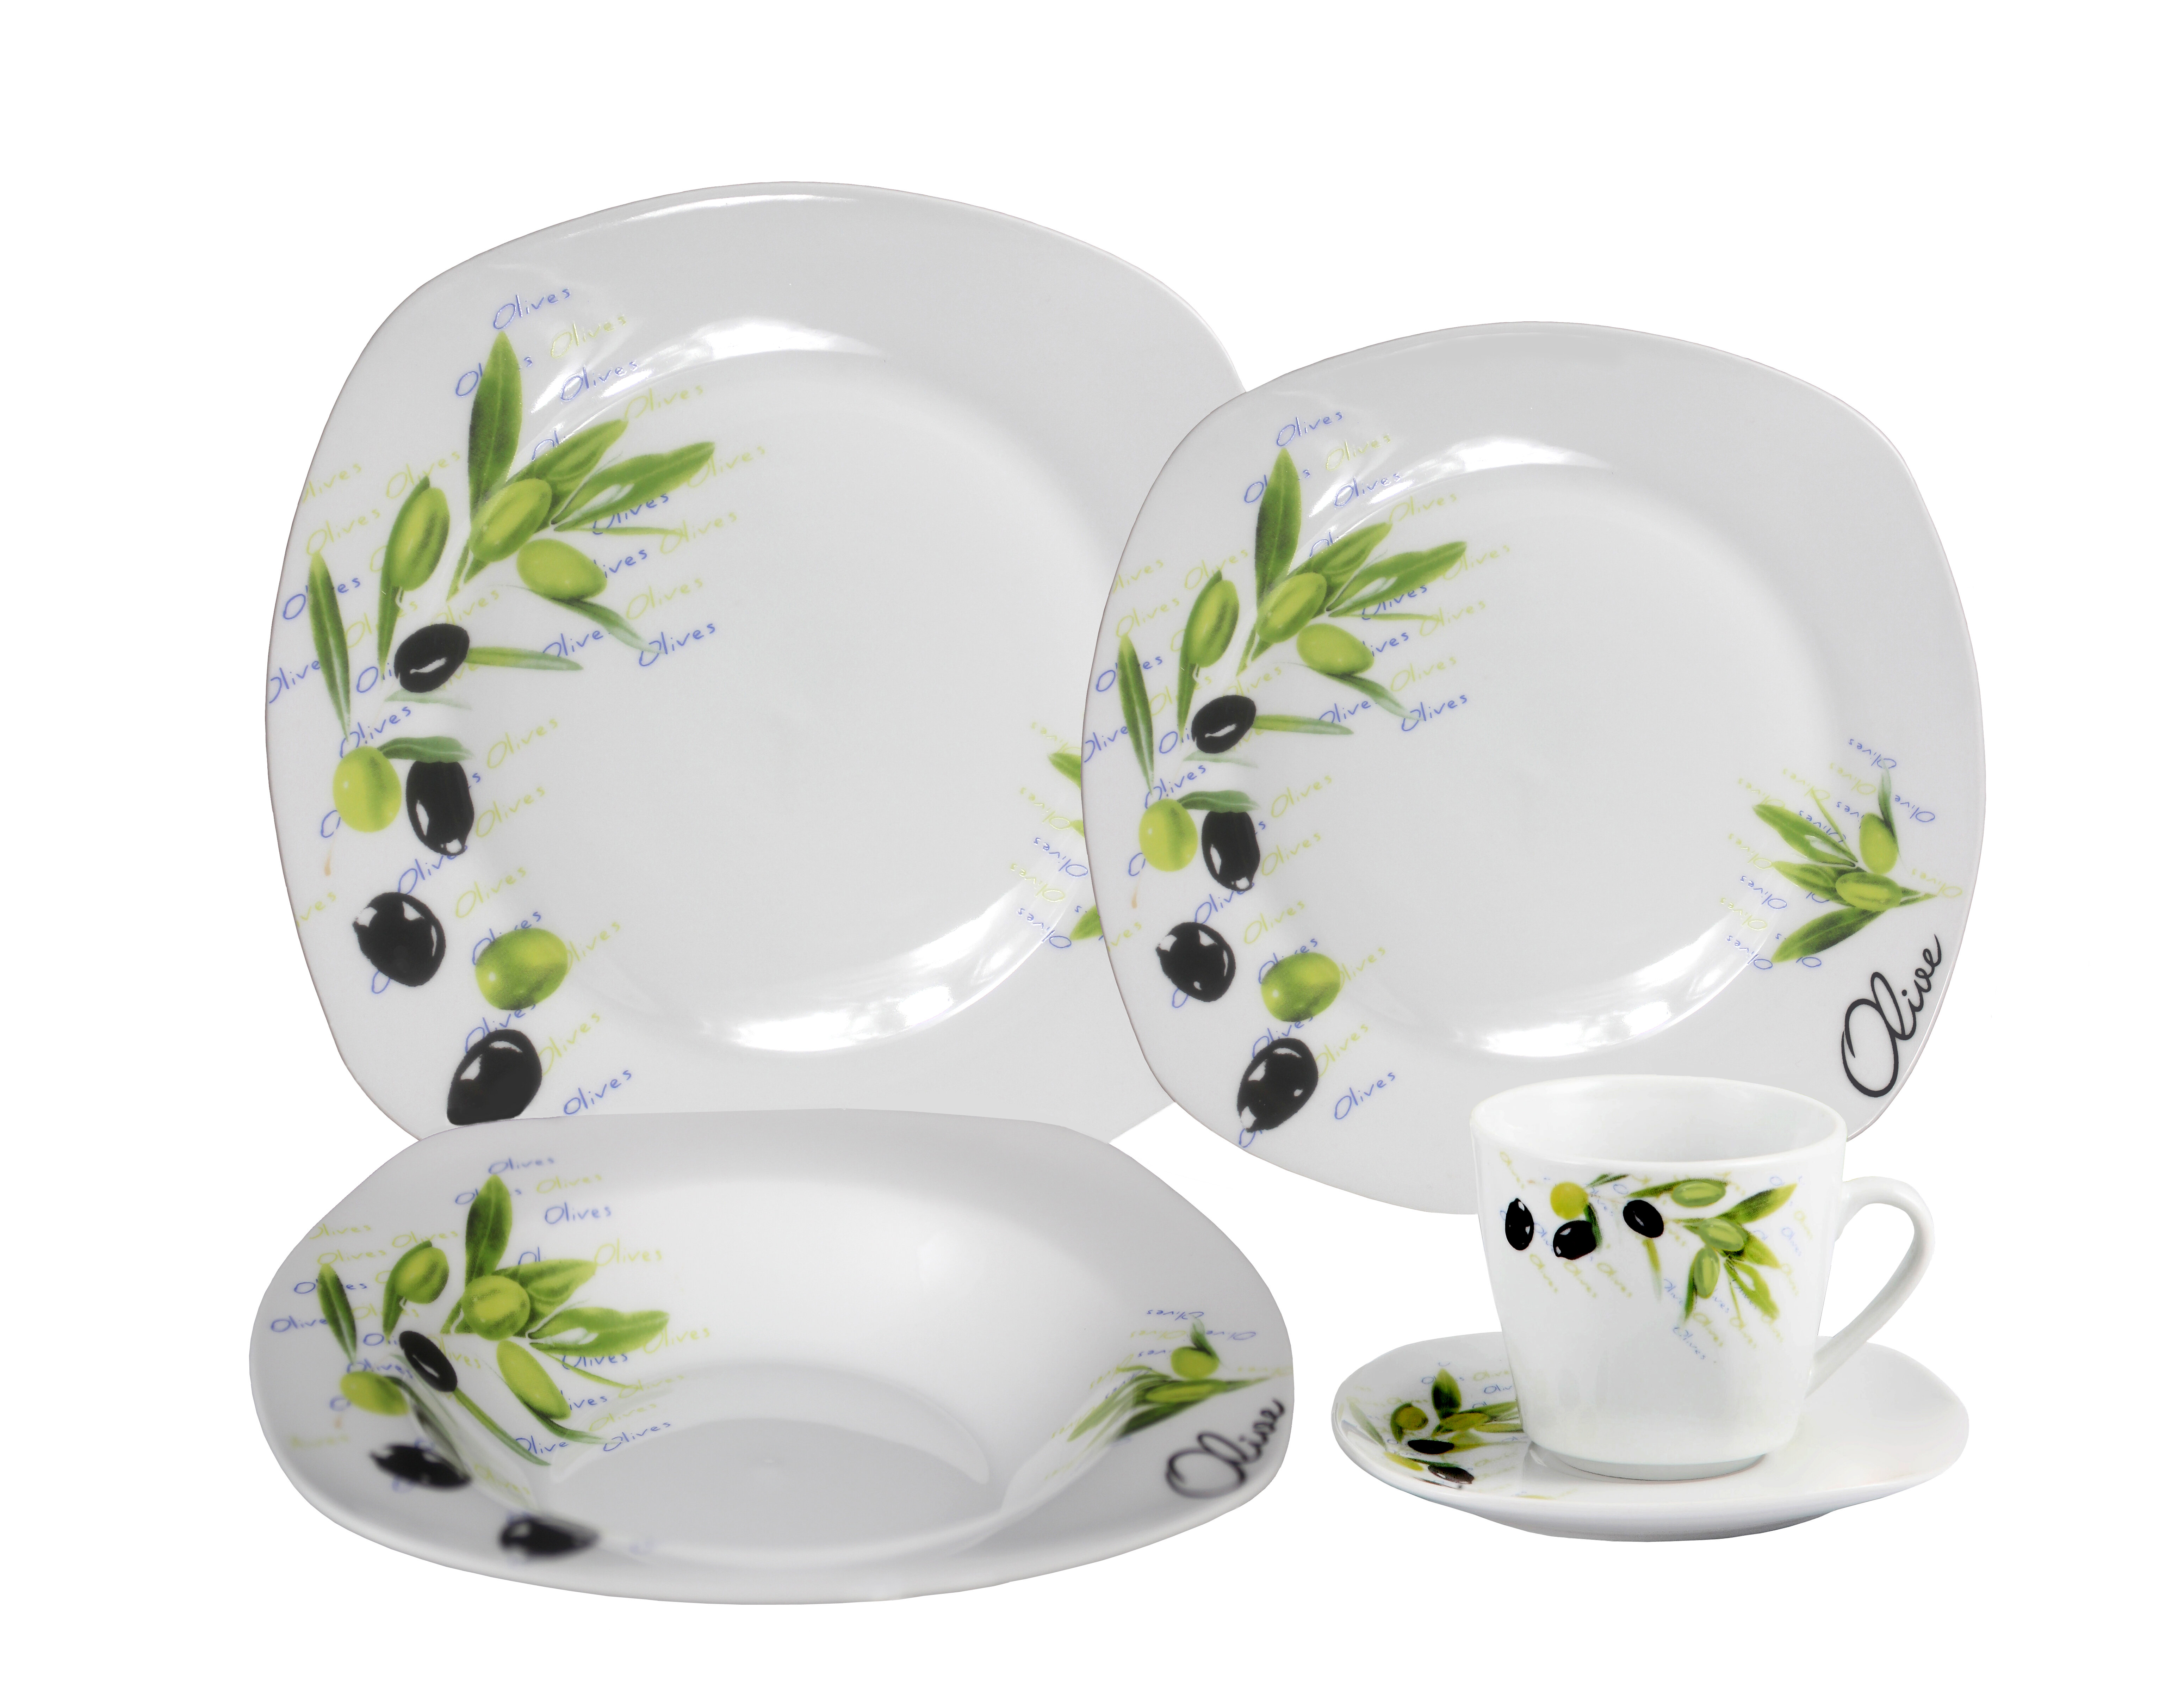 Lorren Home Trends Porcelain 20 Piece Square Dinnerware Set Service for 4 u0026 Reviews | Wayfair  sc 1 st  Wayfair & Lorren Home Trends Porcelain 20 Piece Square Dinnerware Set Service ...